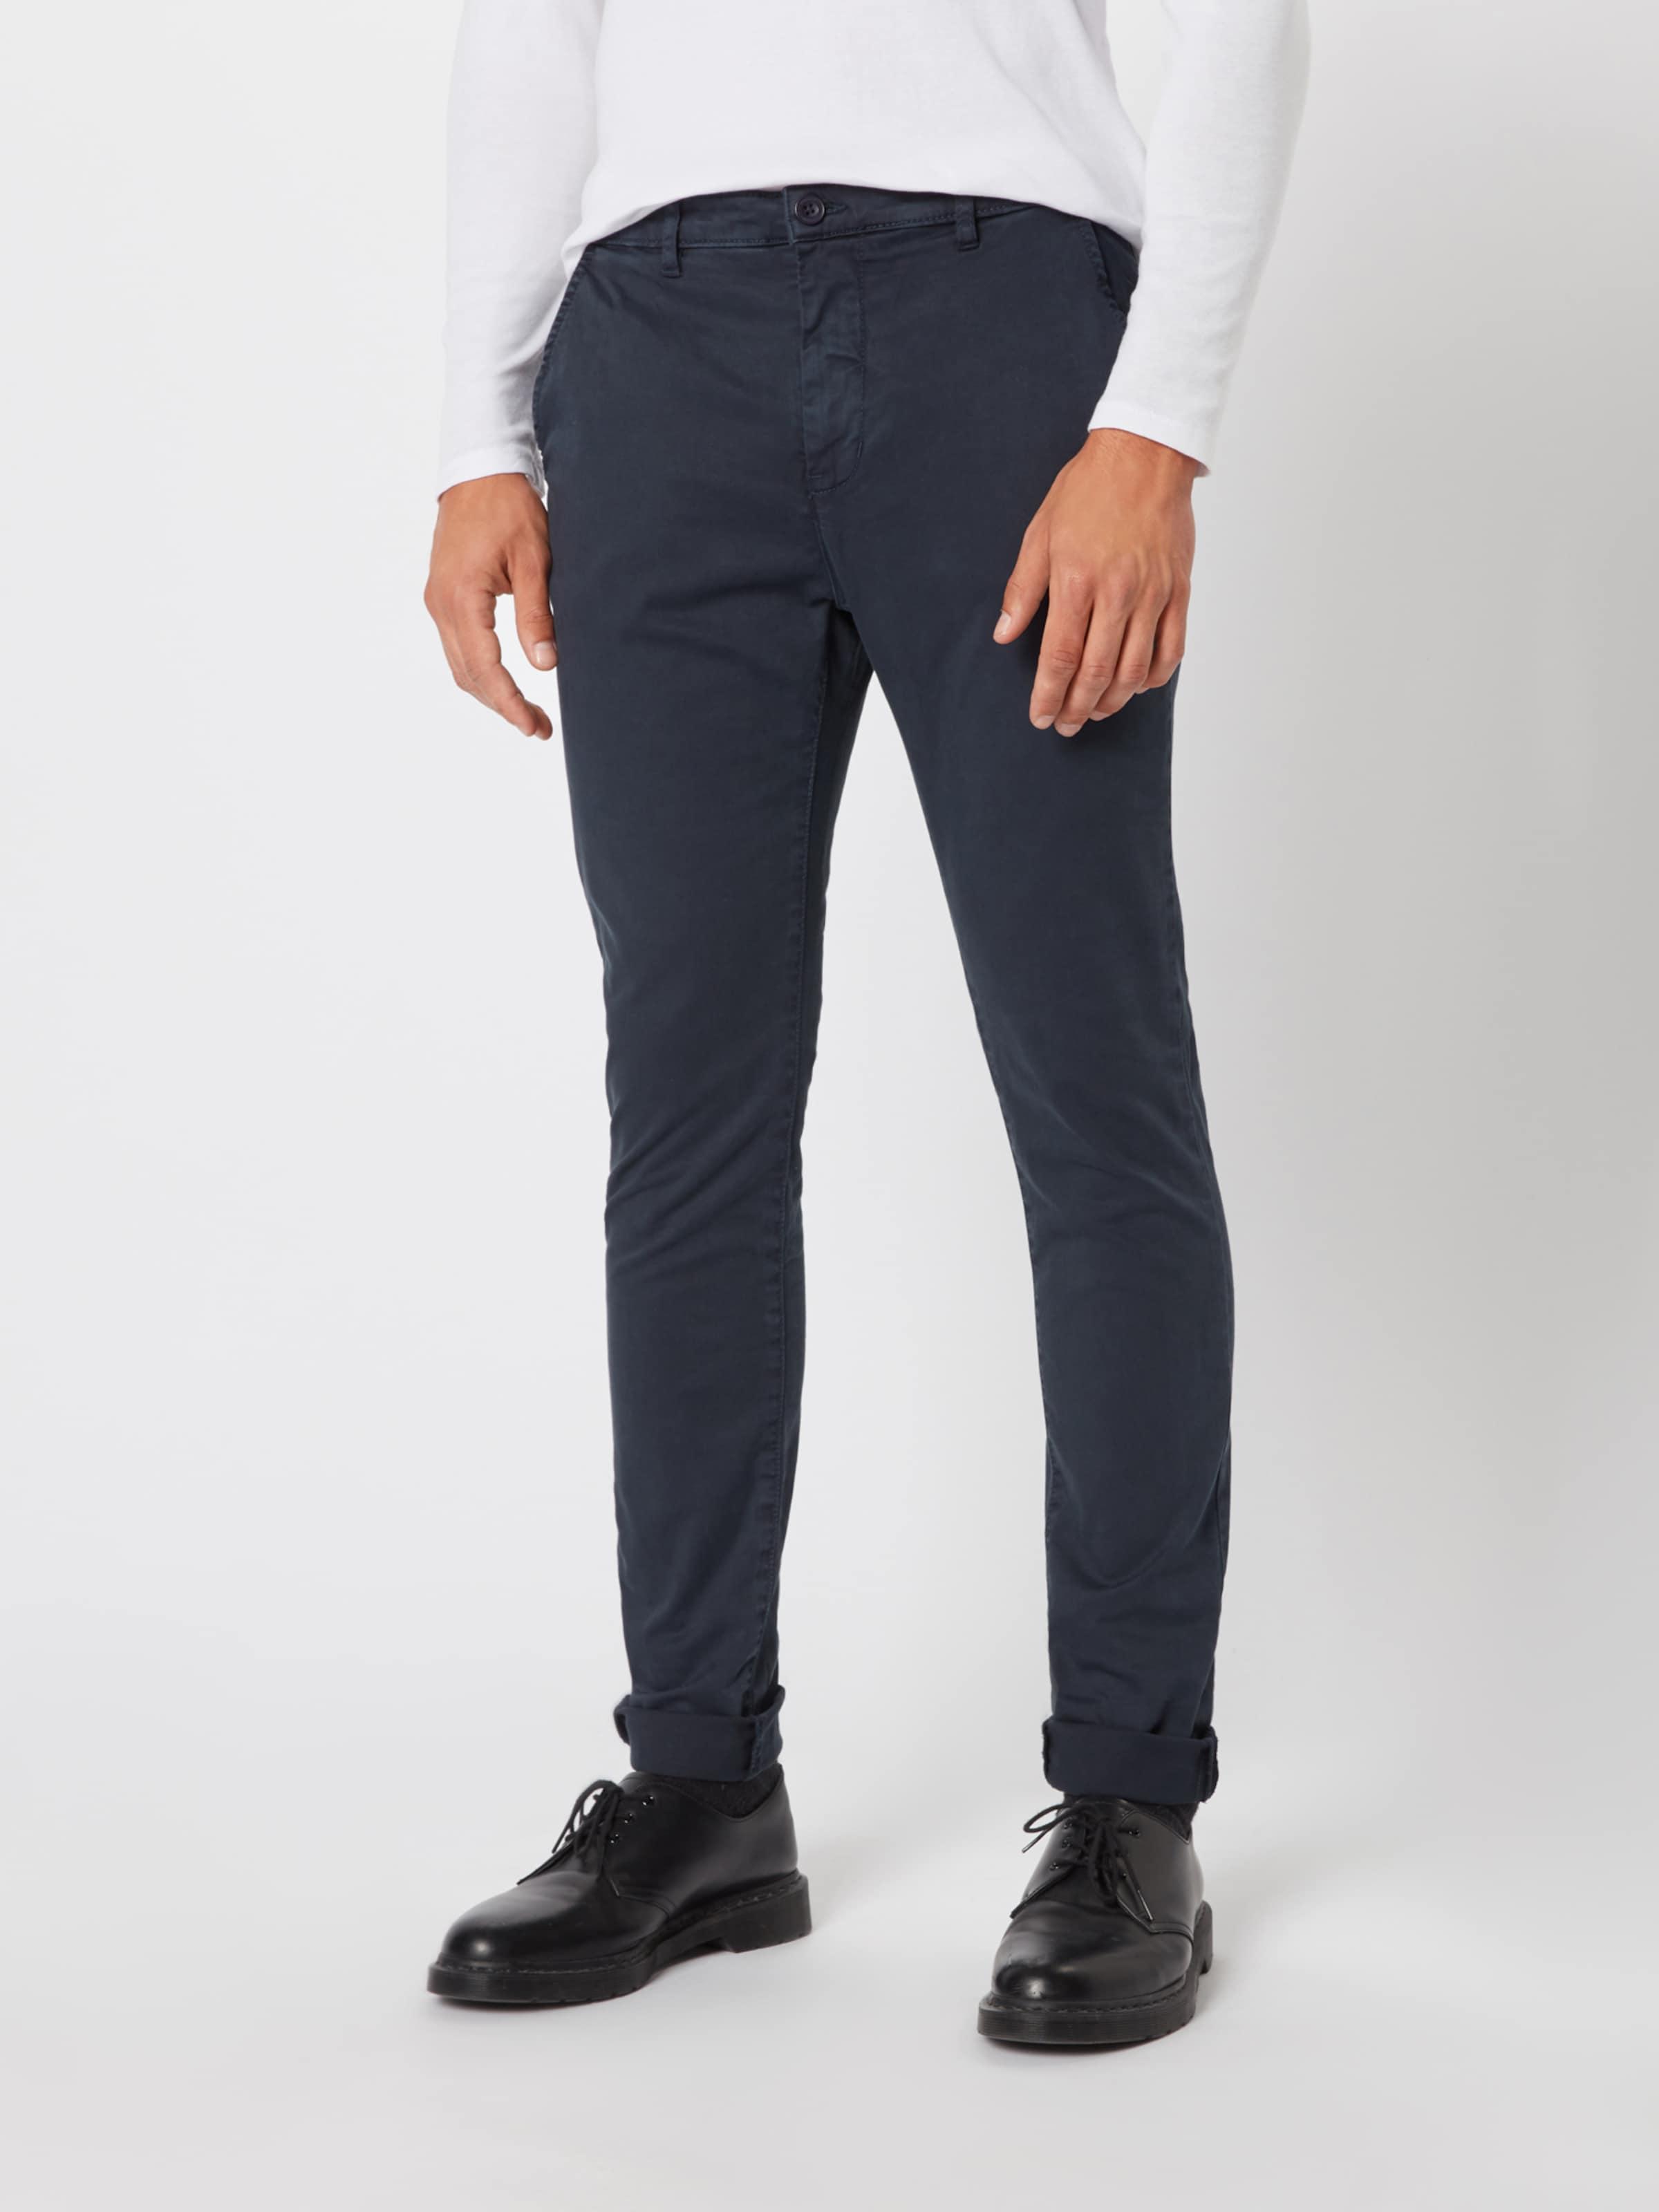 En Bleu Friday Marine Chino Casual Pantalon 534RjLqA